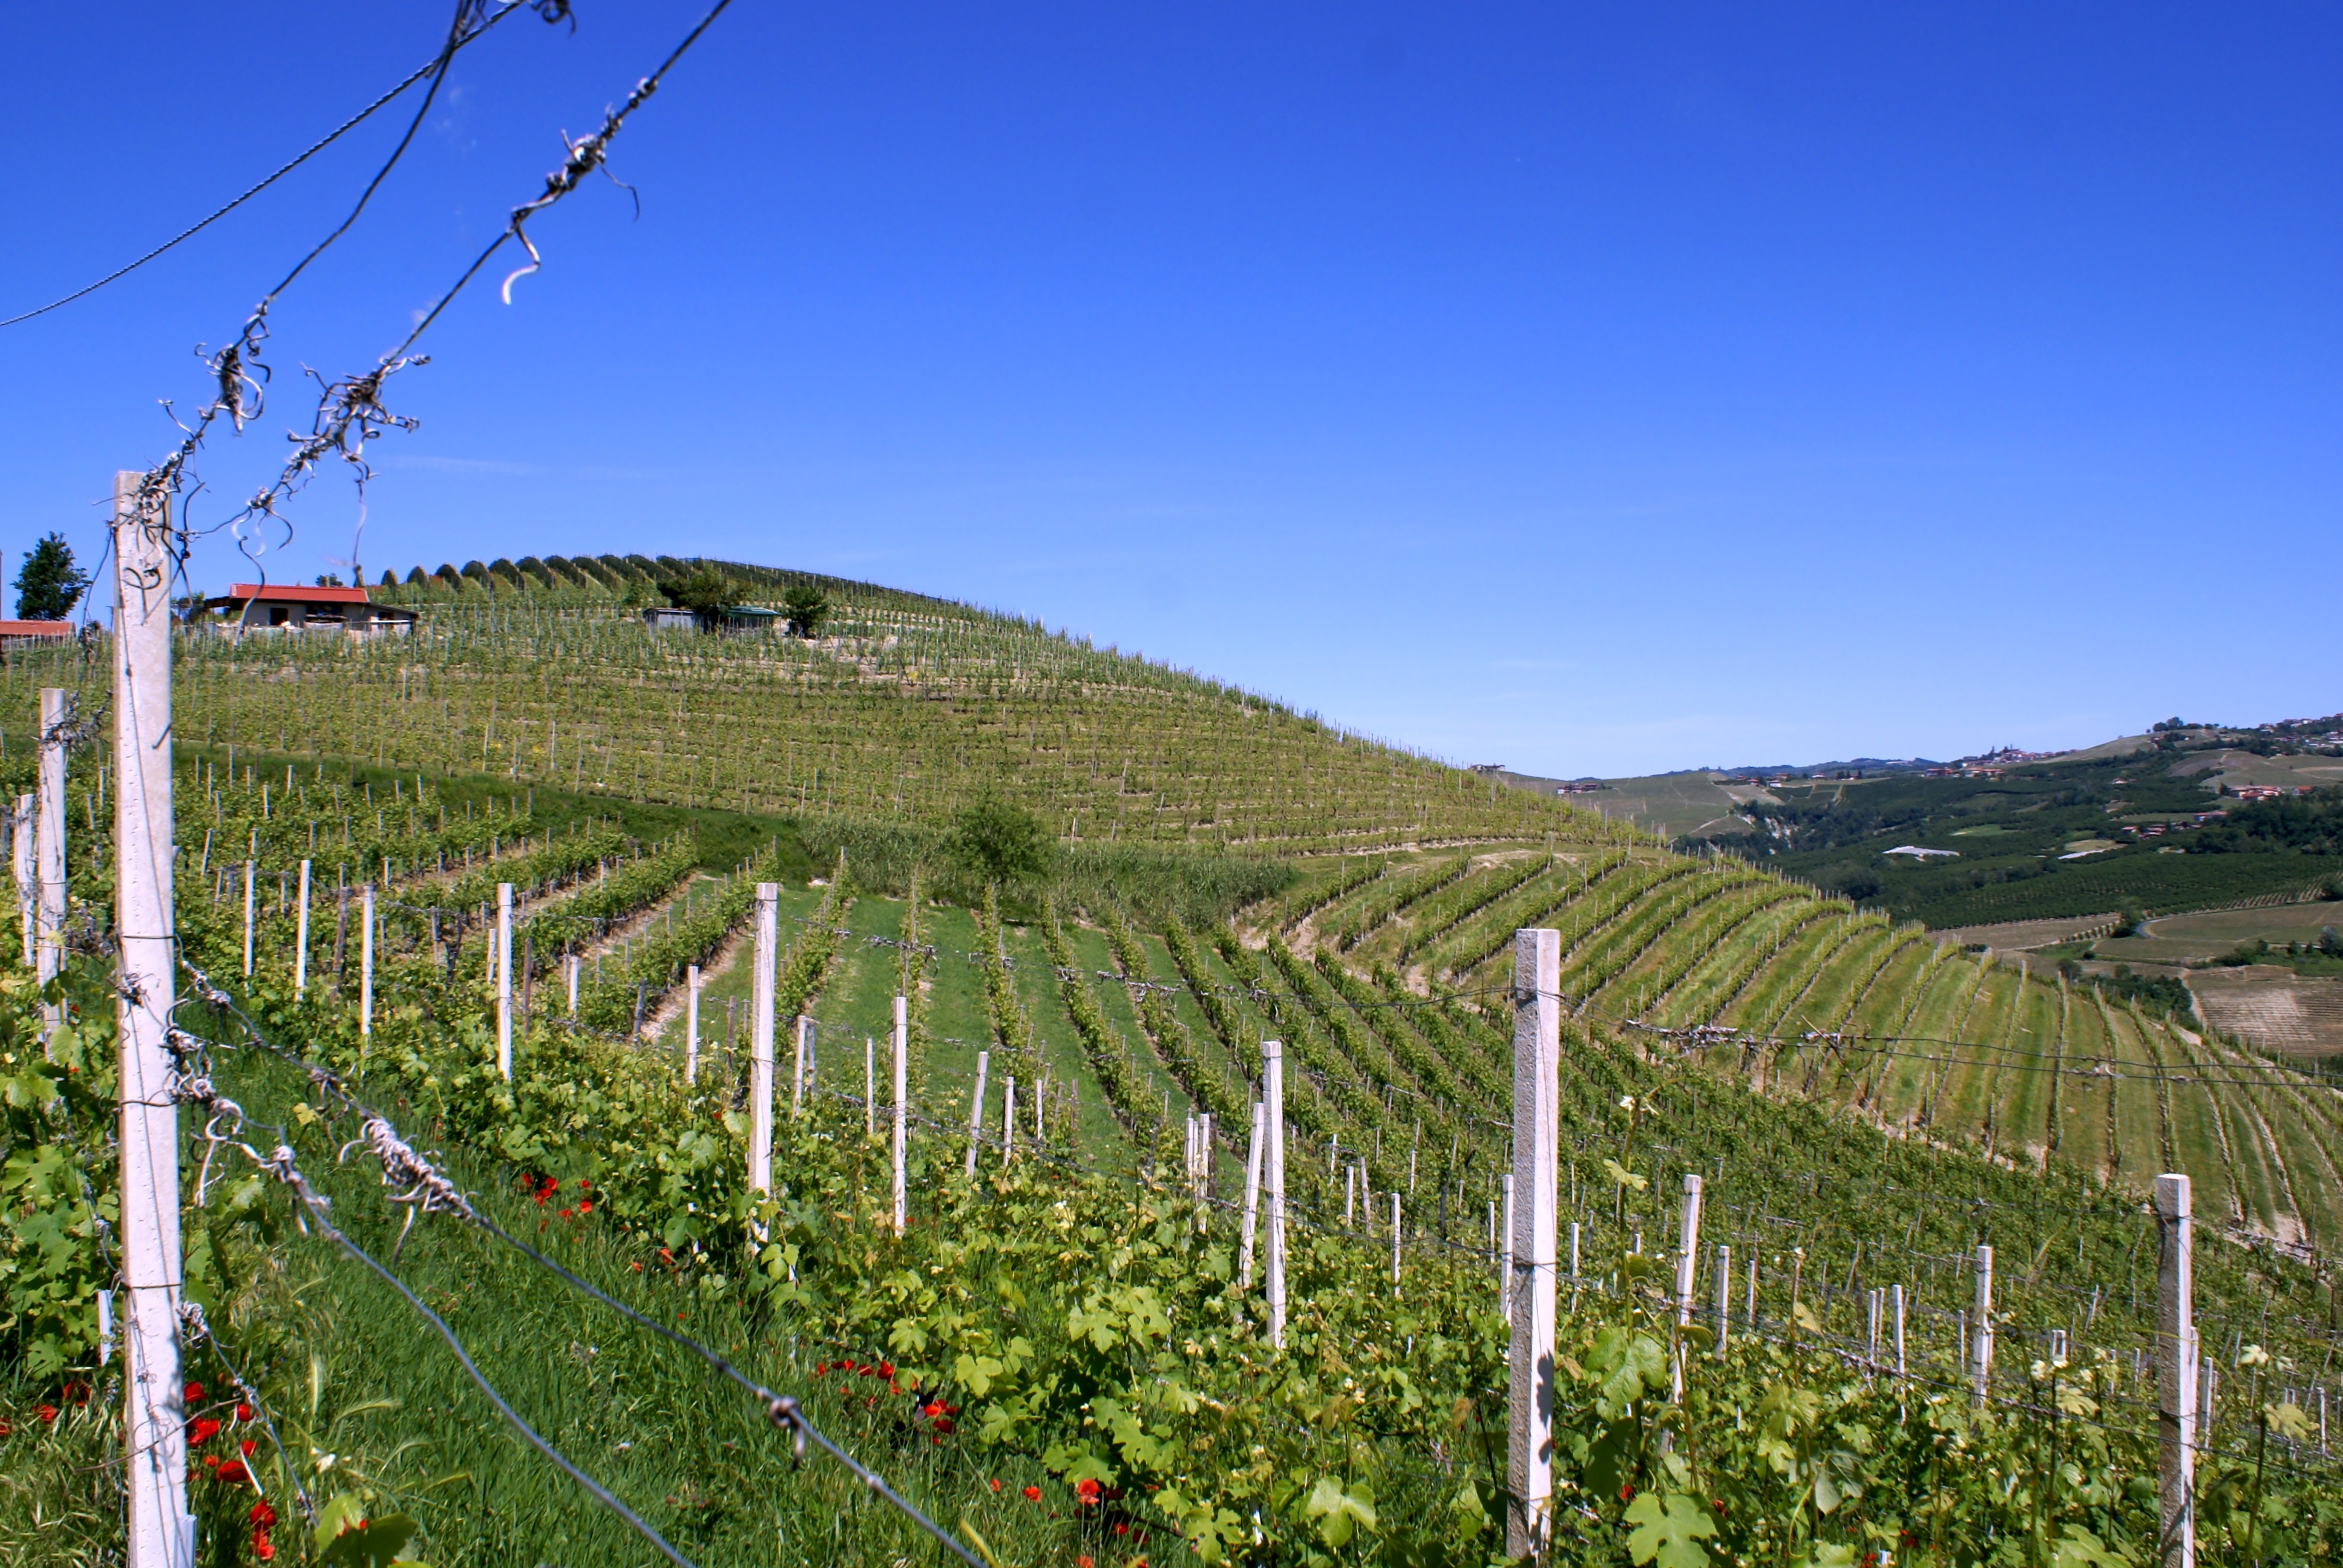 Prapó vineyard Barolo Italy